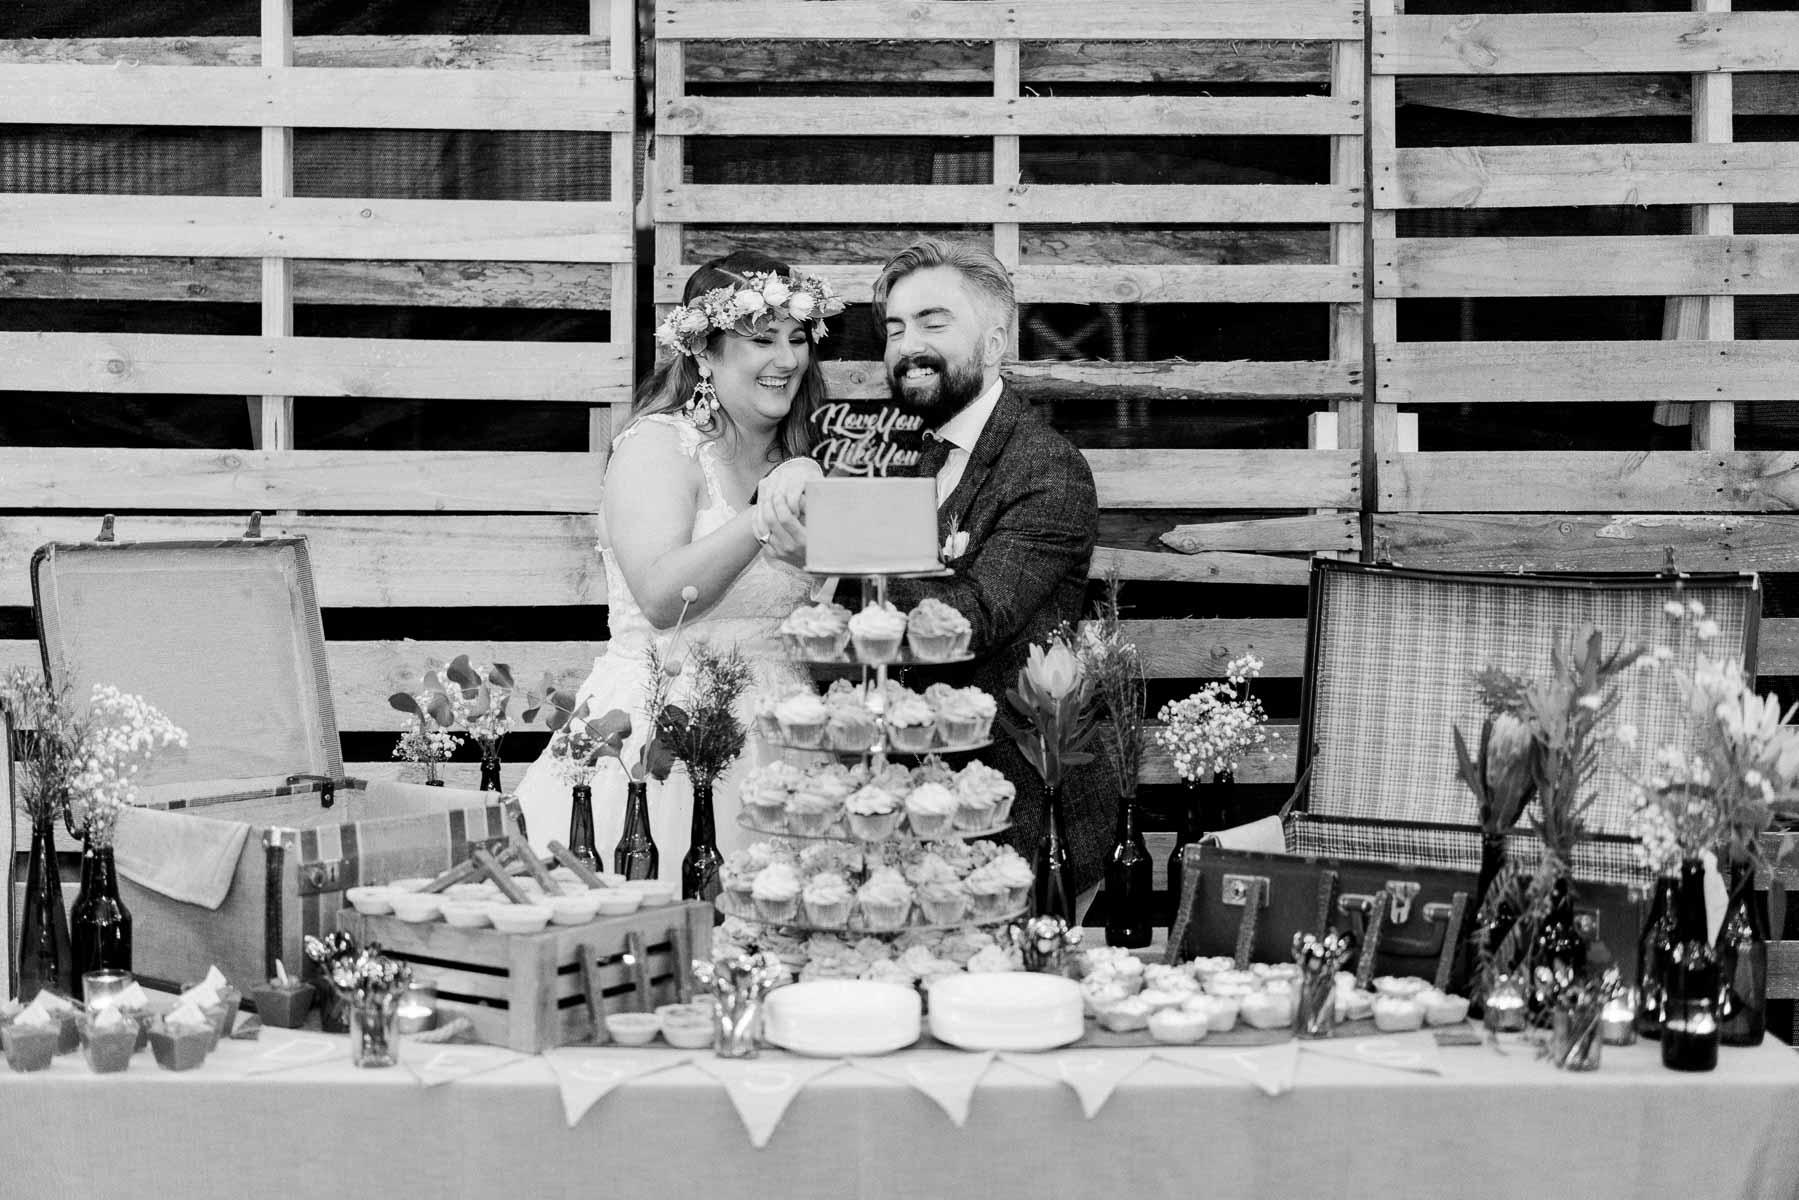 adams-farm-coldstream-yarra-valley-wedding-heart+soul-weddings-kel-jarryd-06162.jpg